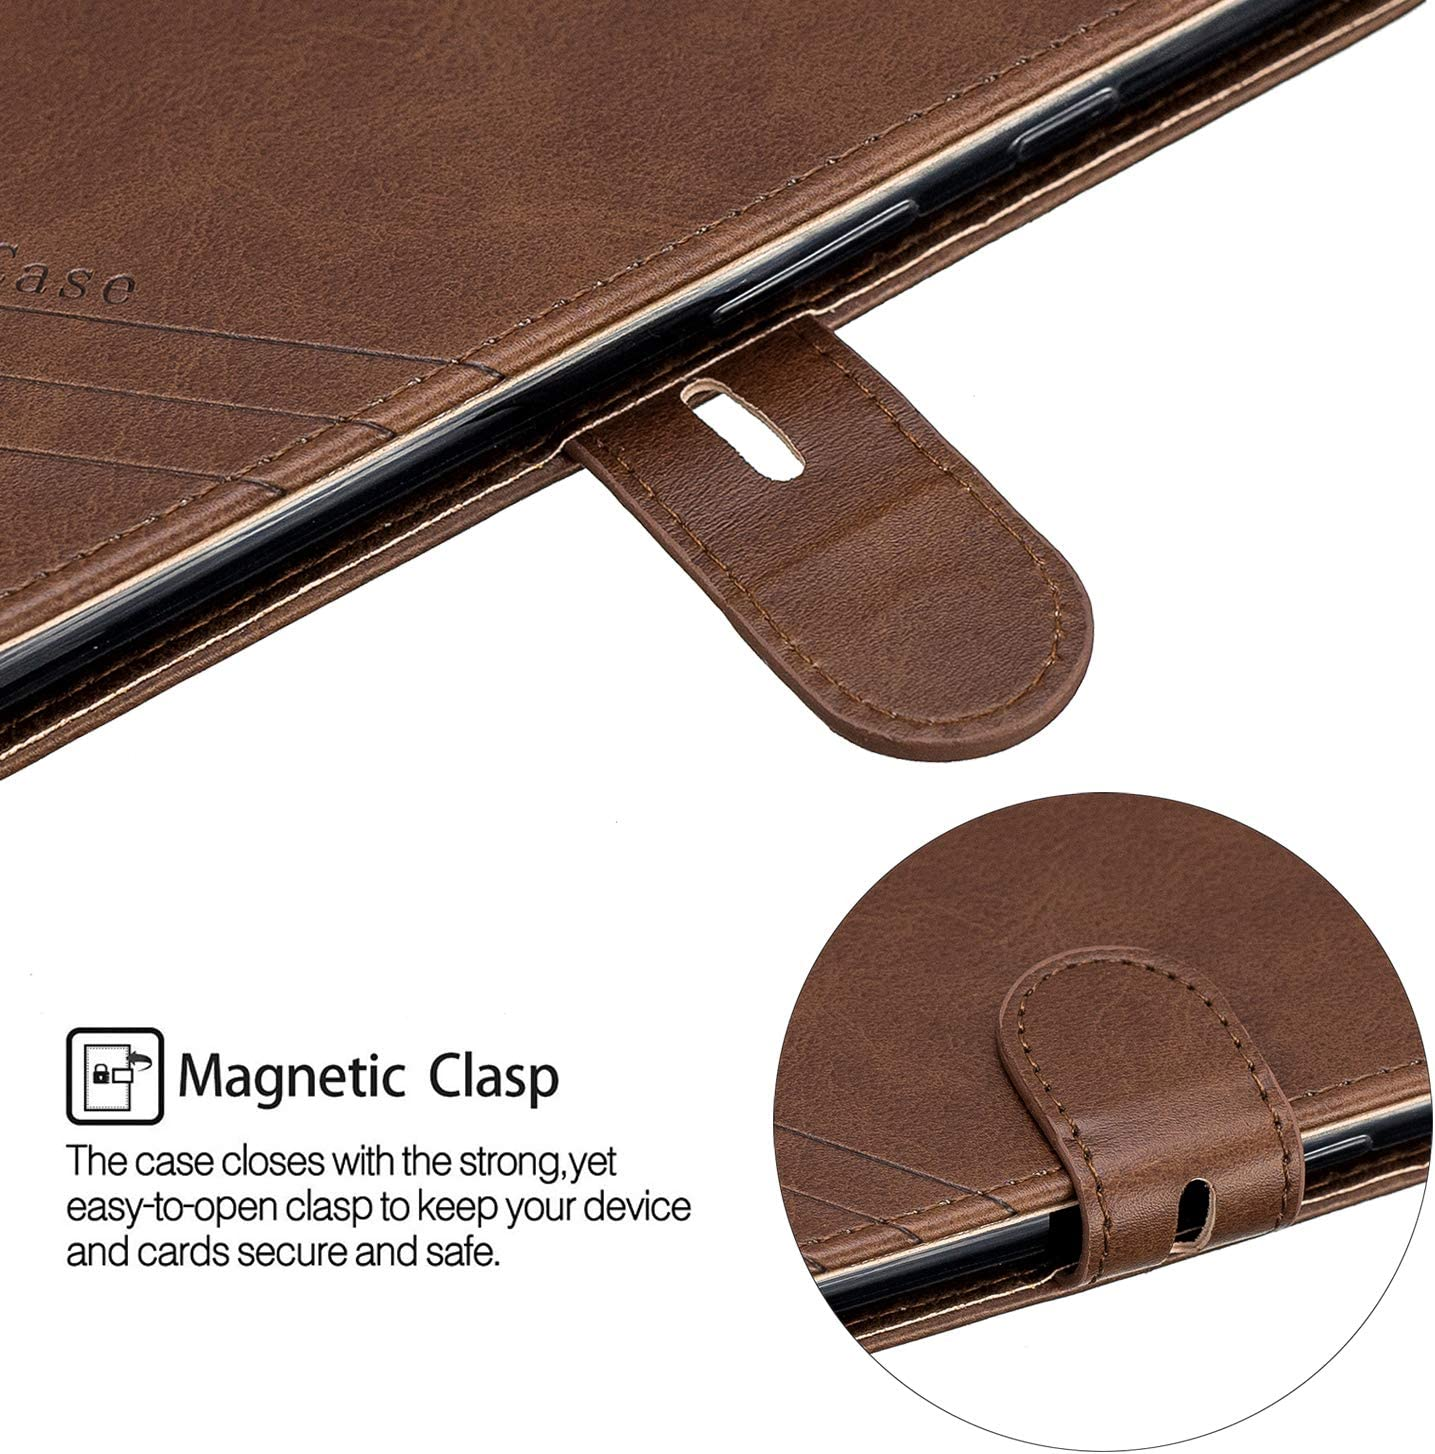 NEXCURIO Wallet Case for Google Pixel 3a with Card Holder Side Pocket Kickstand Shockproof Leather Flip Cover Case for Google Pixel3a NEHEX120406 Red